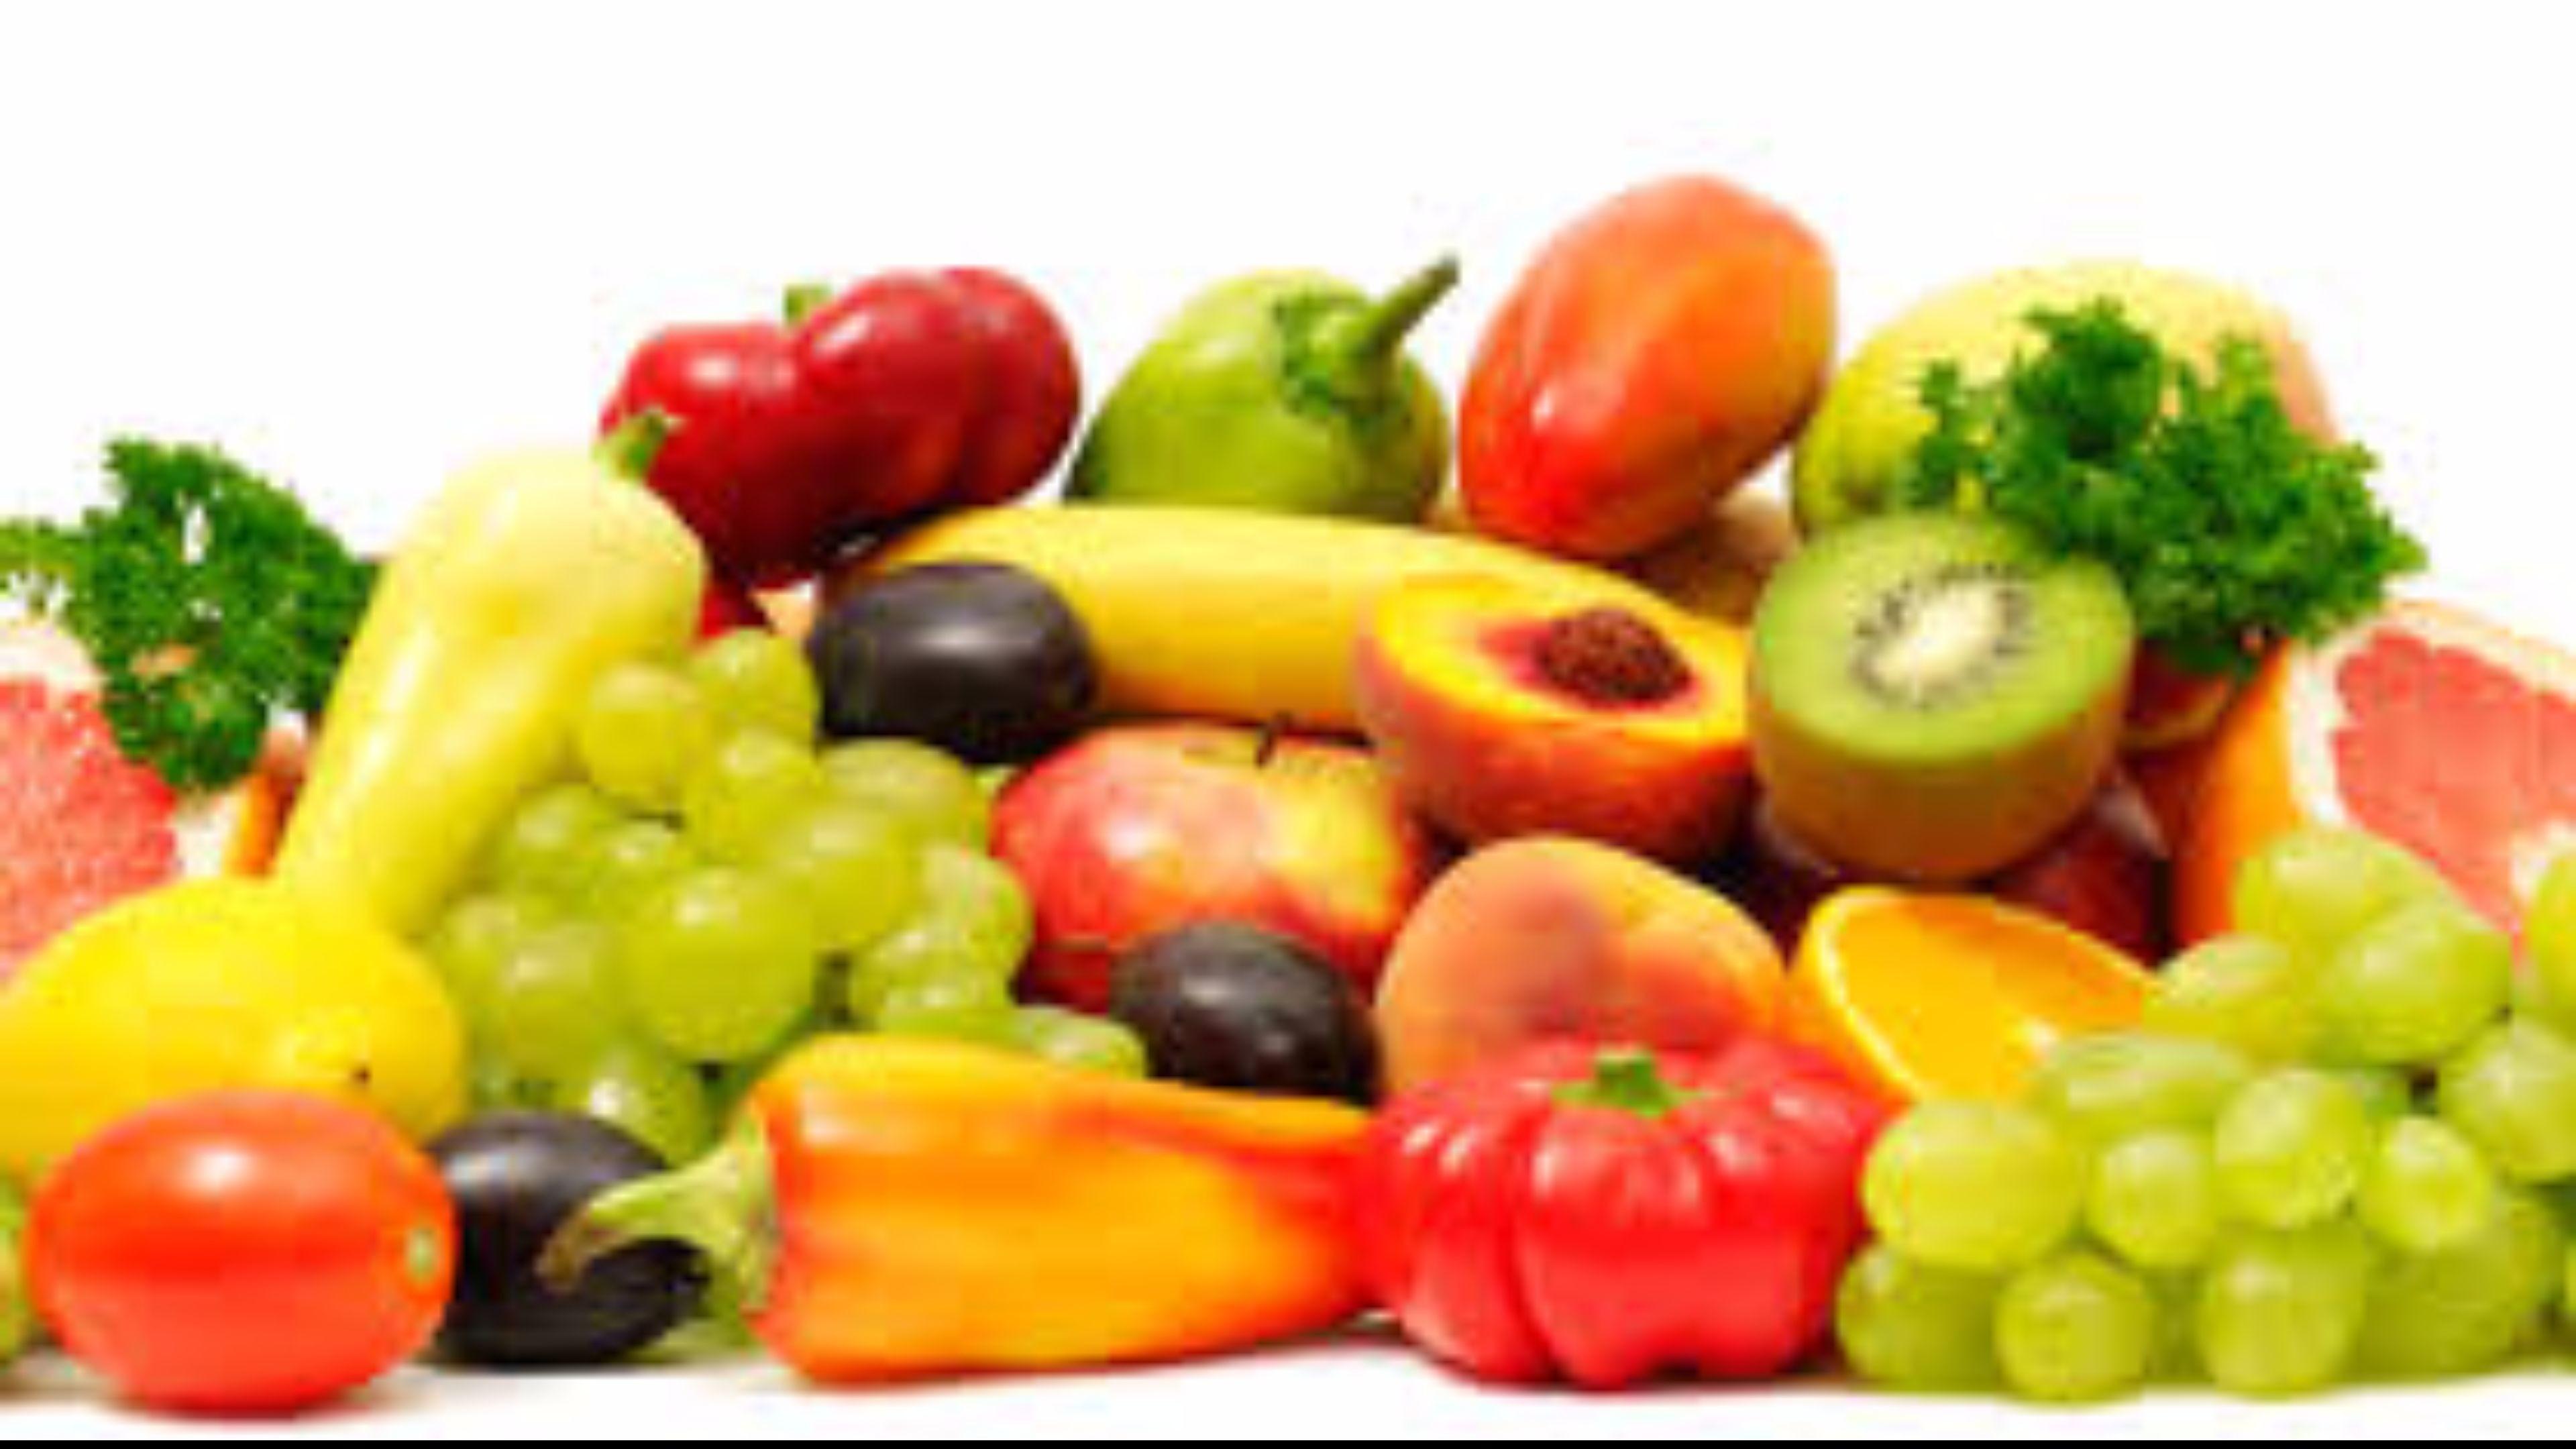 Res: 3840x2160, Tropical Fruit 4K Wallpaper